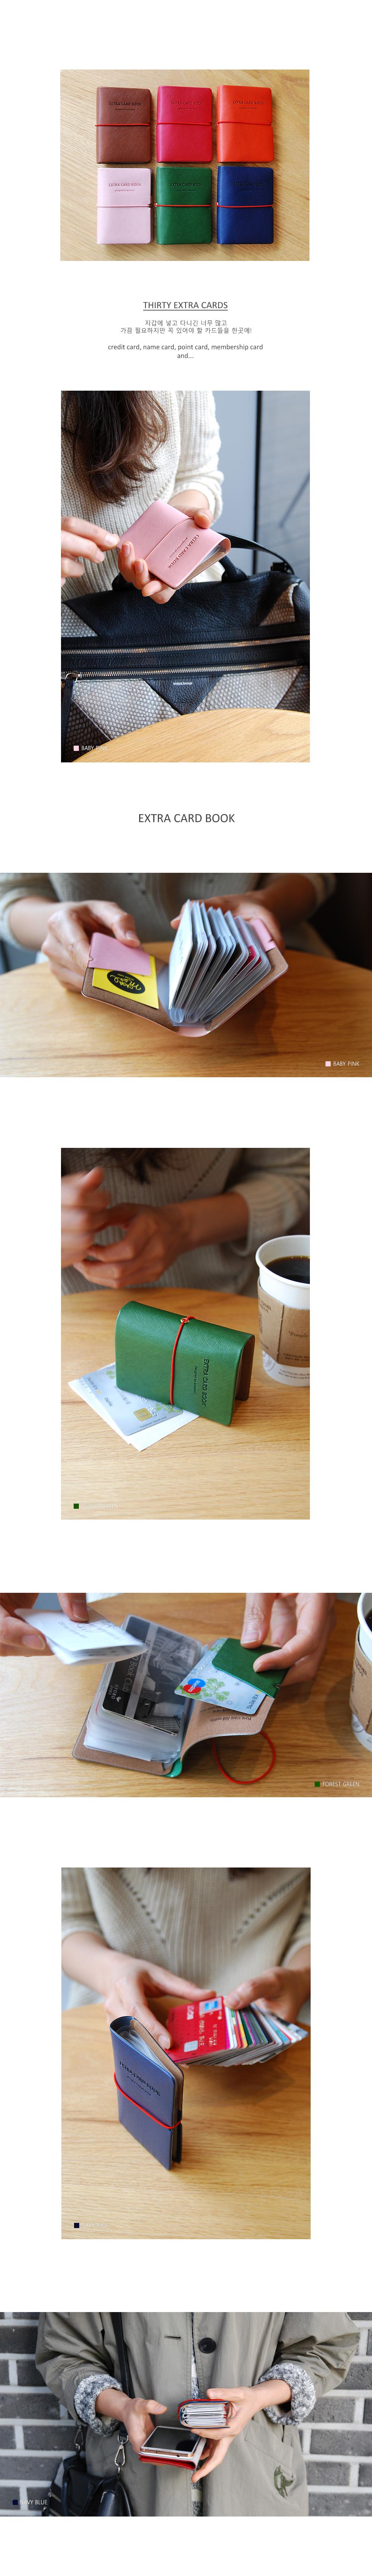 Extra Card Book - 플레픽, 8,800원, 동전/카드지갑, 카드지갑